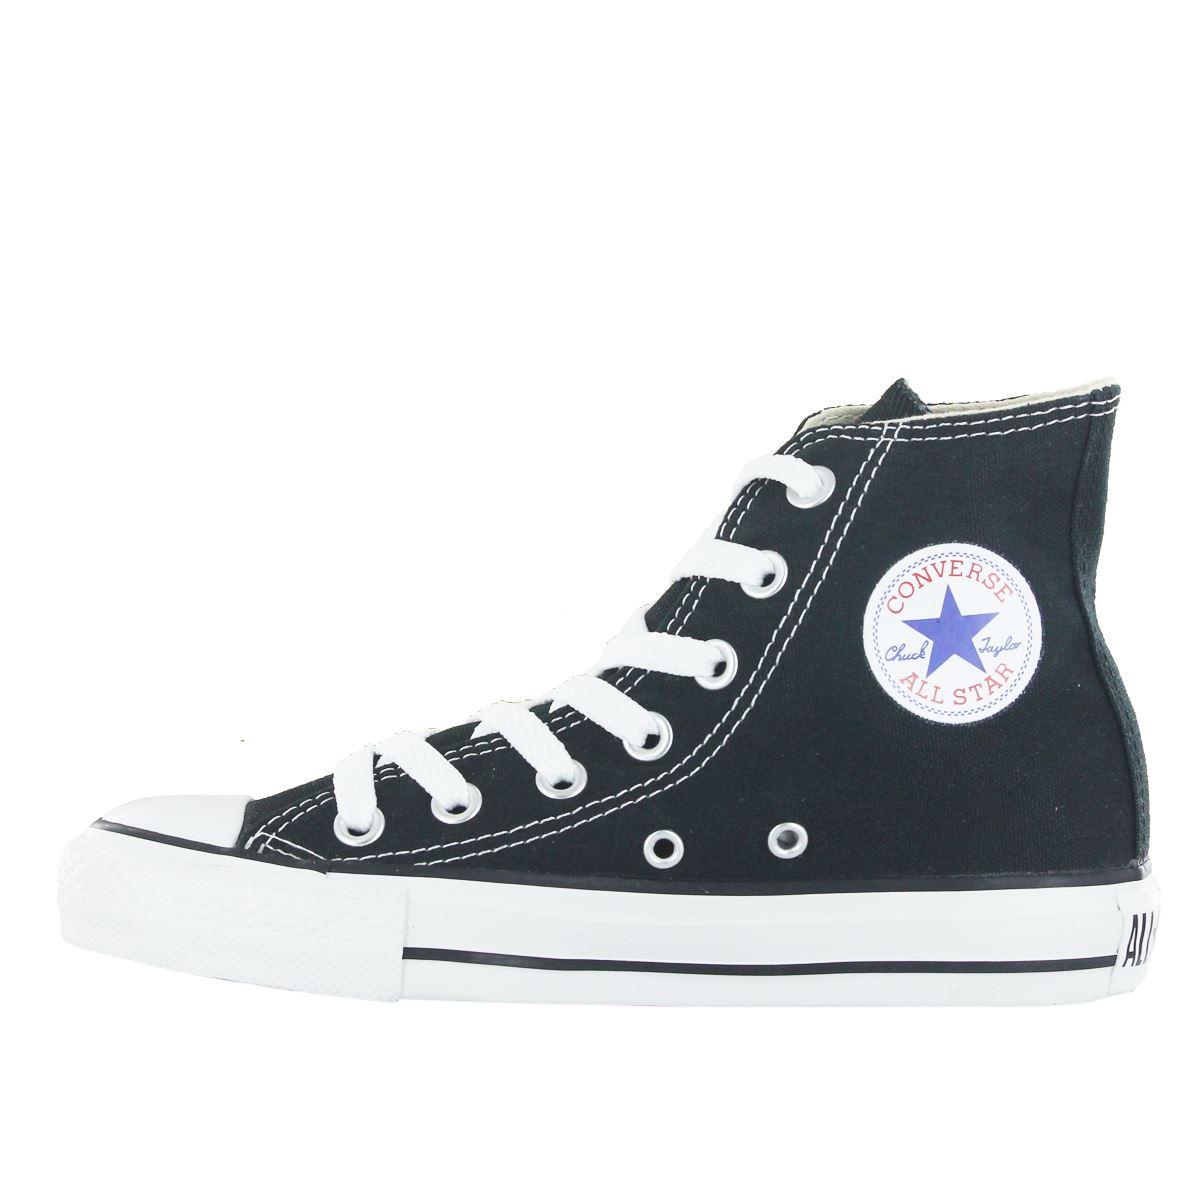 Converse-Chuck-Taylor-All-Star-Hi-Canvas-Mens-Womens-Ladies-Unisex-Trainers miniatuur 7